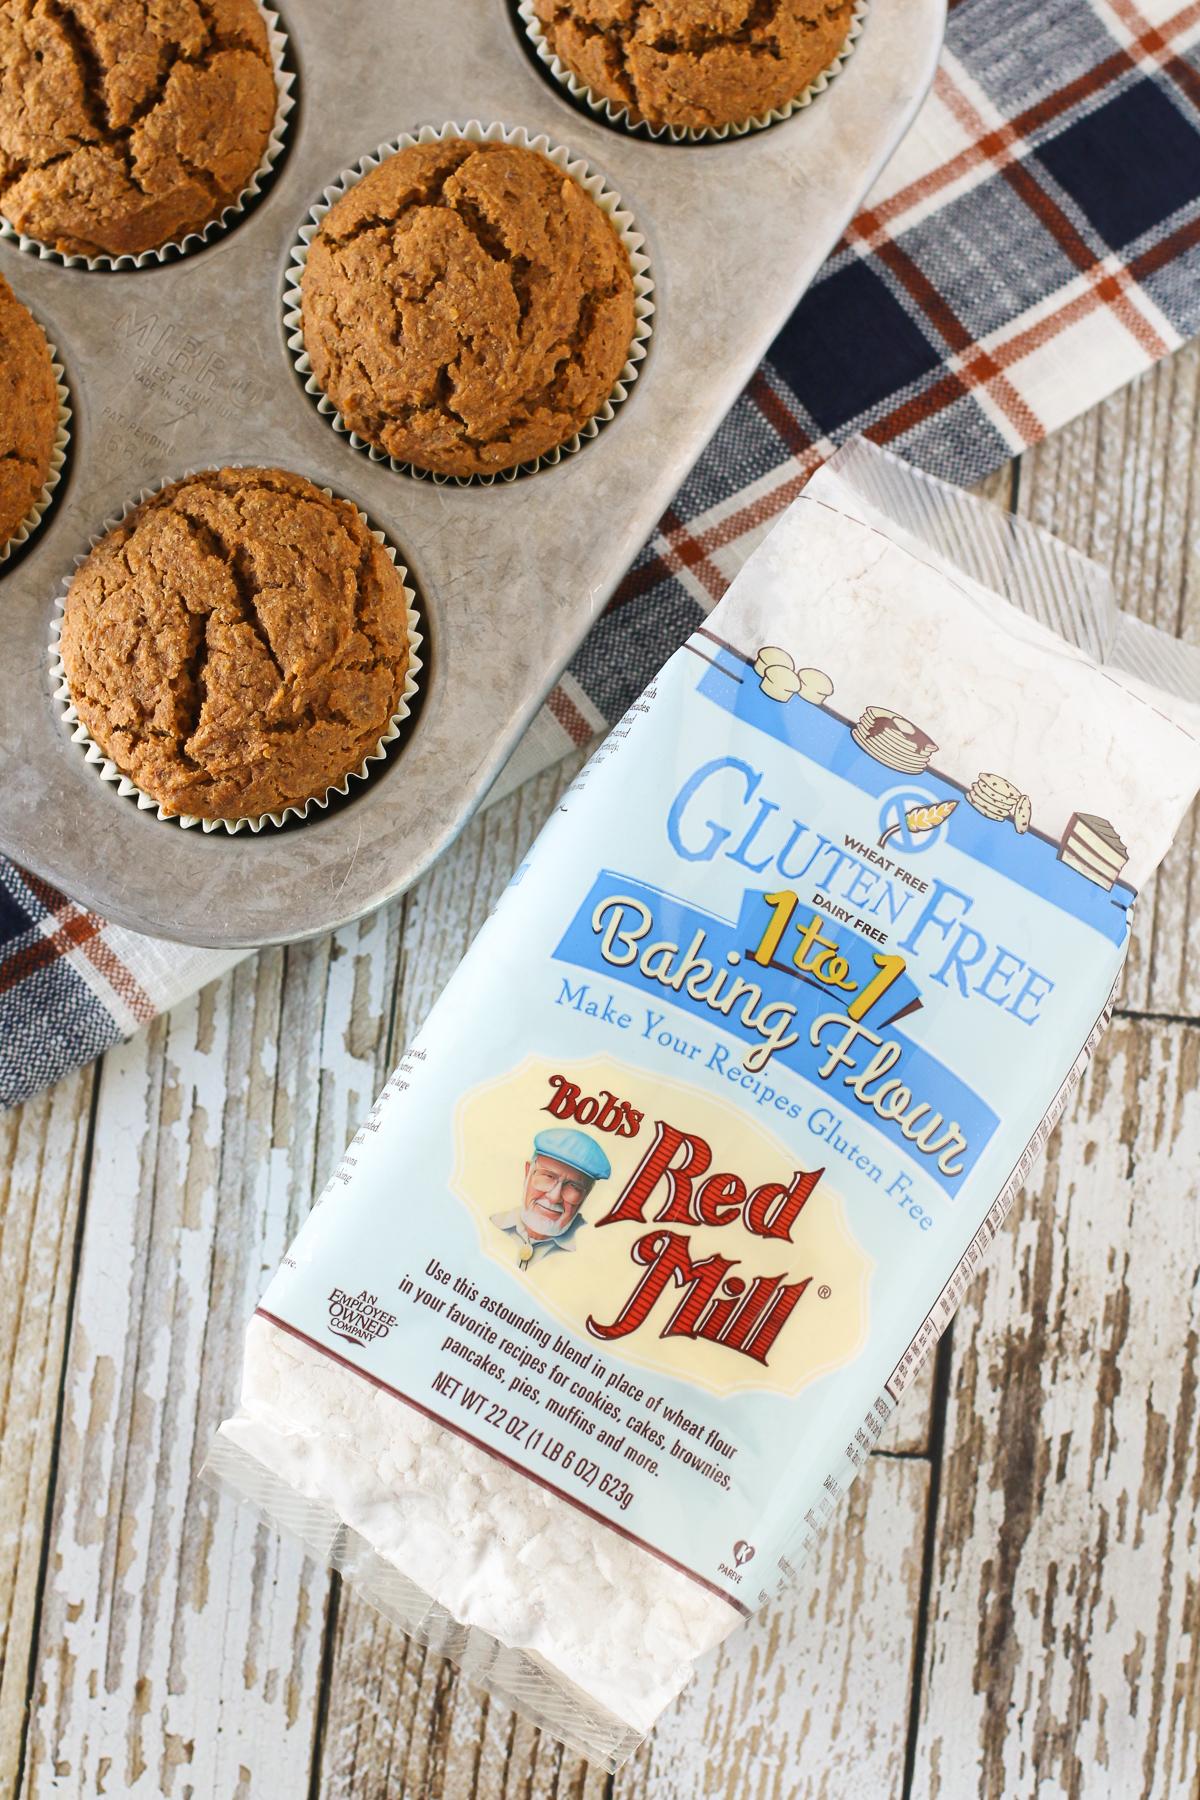 Gluten Free Vegan Pumpkin Spice Muffins, made with Bob's Red Mill Gluten Free 1-to-1 Baking Flour.